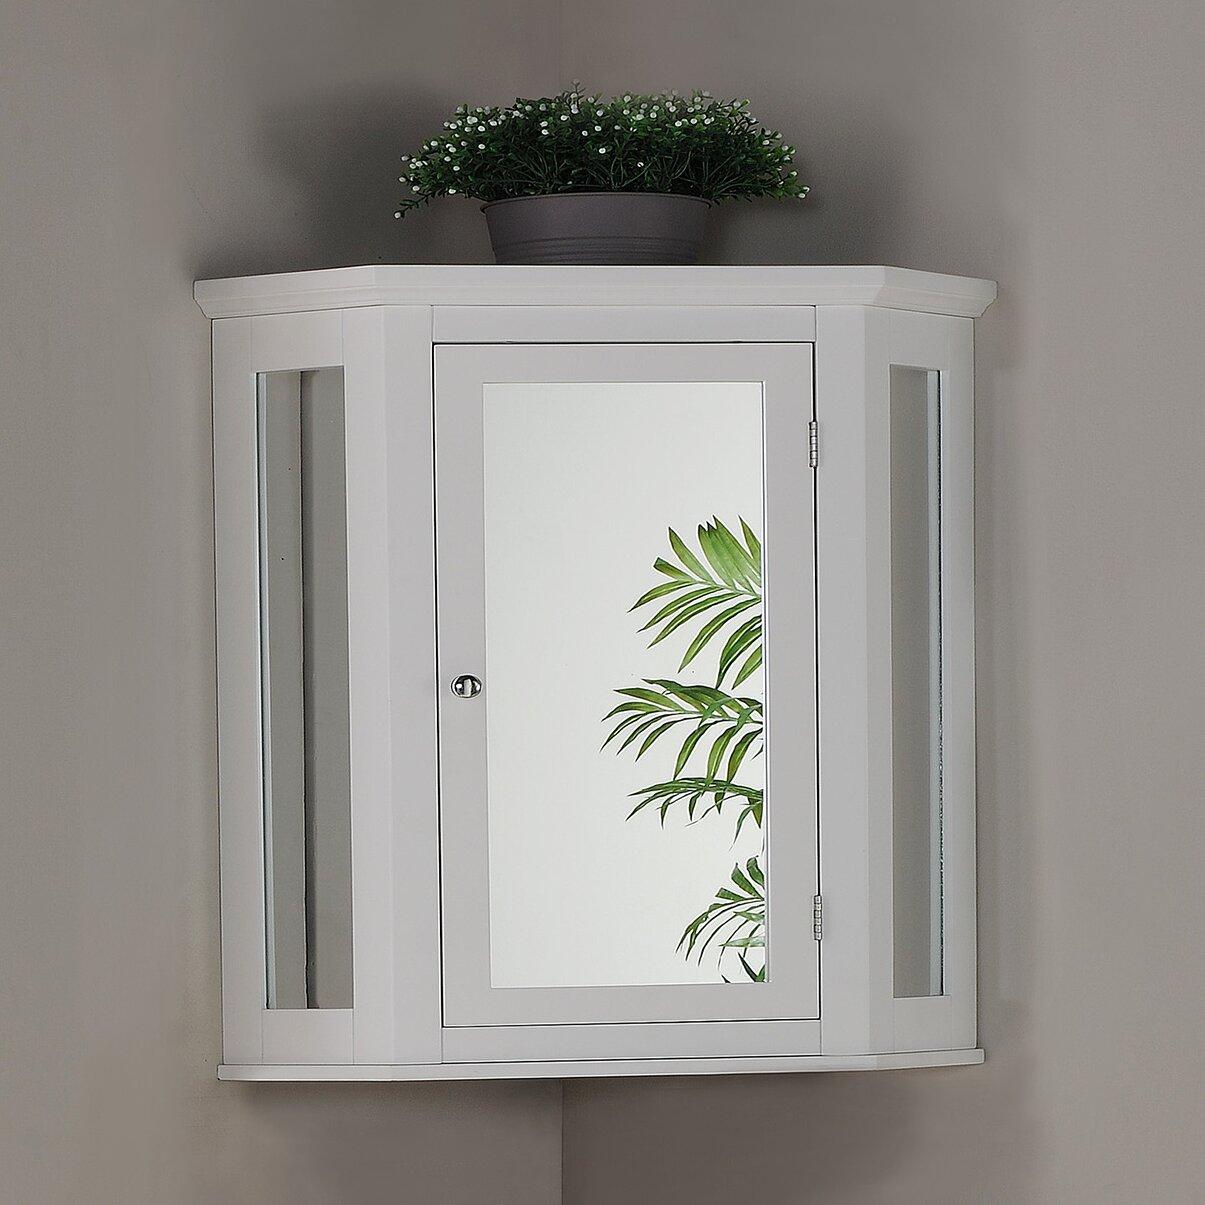 Elegant home fashions wales 22 5 x 24 corner wall - Corner wall cabinets for bathroom ...